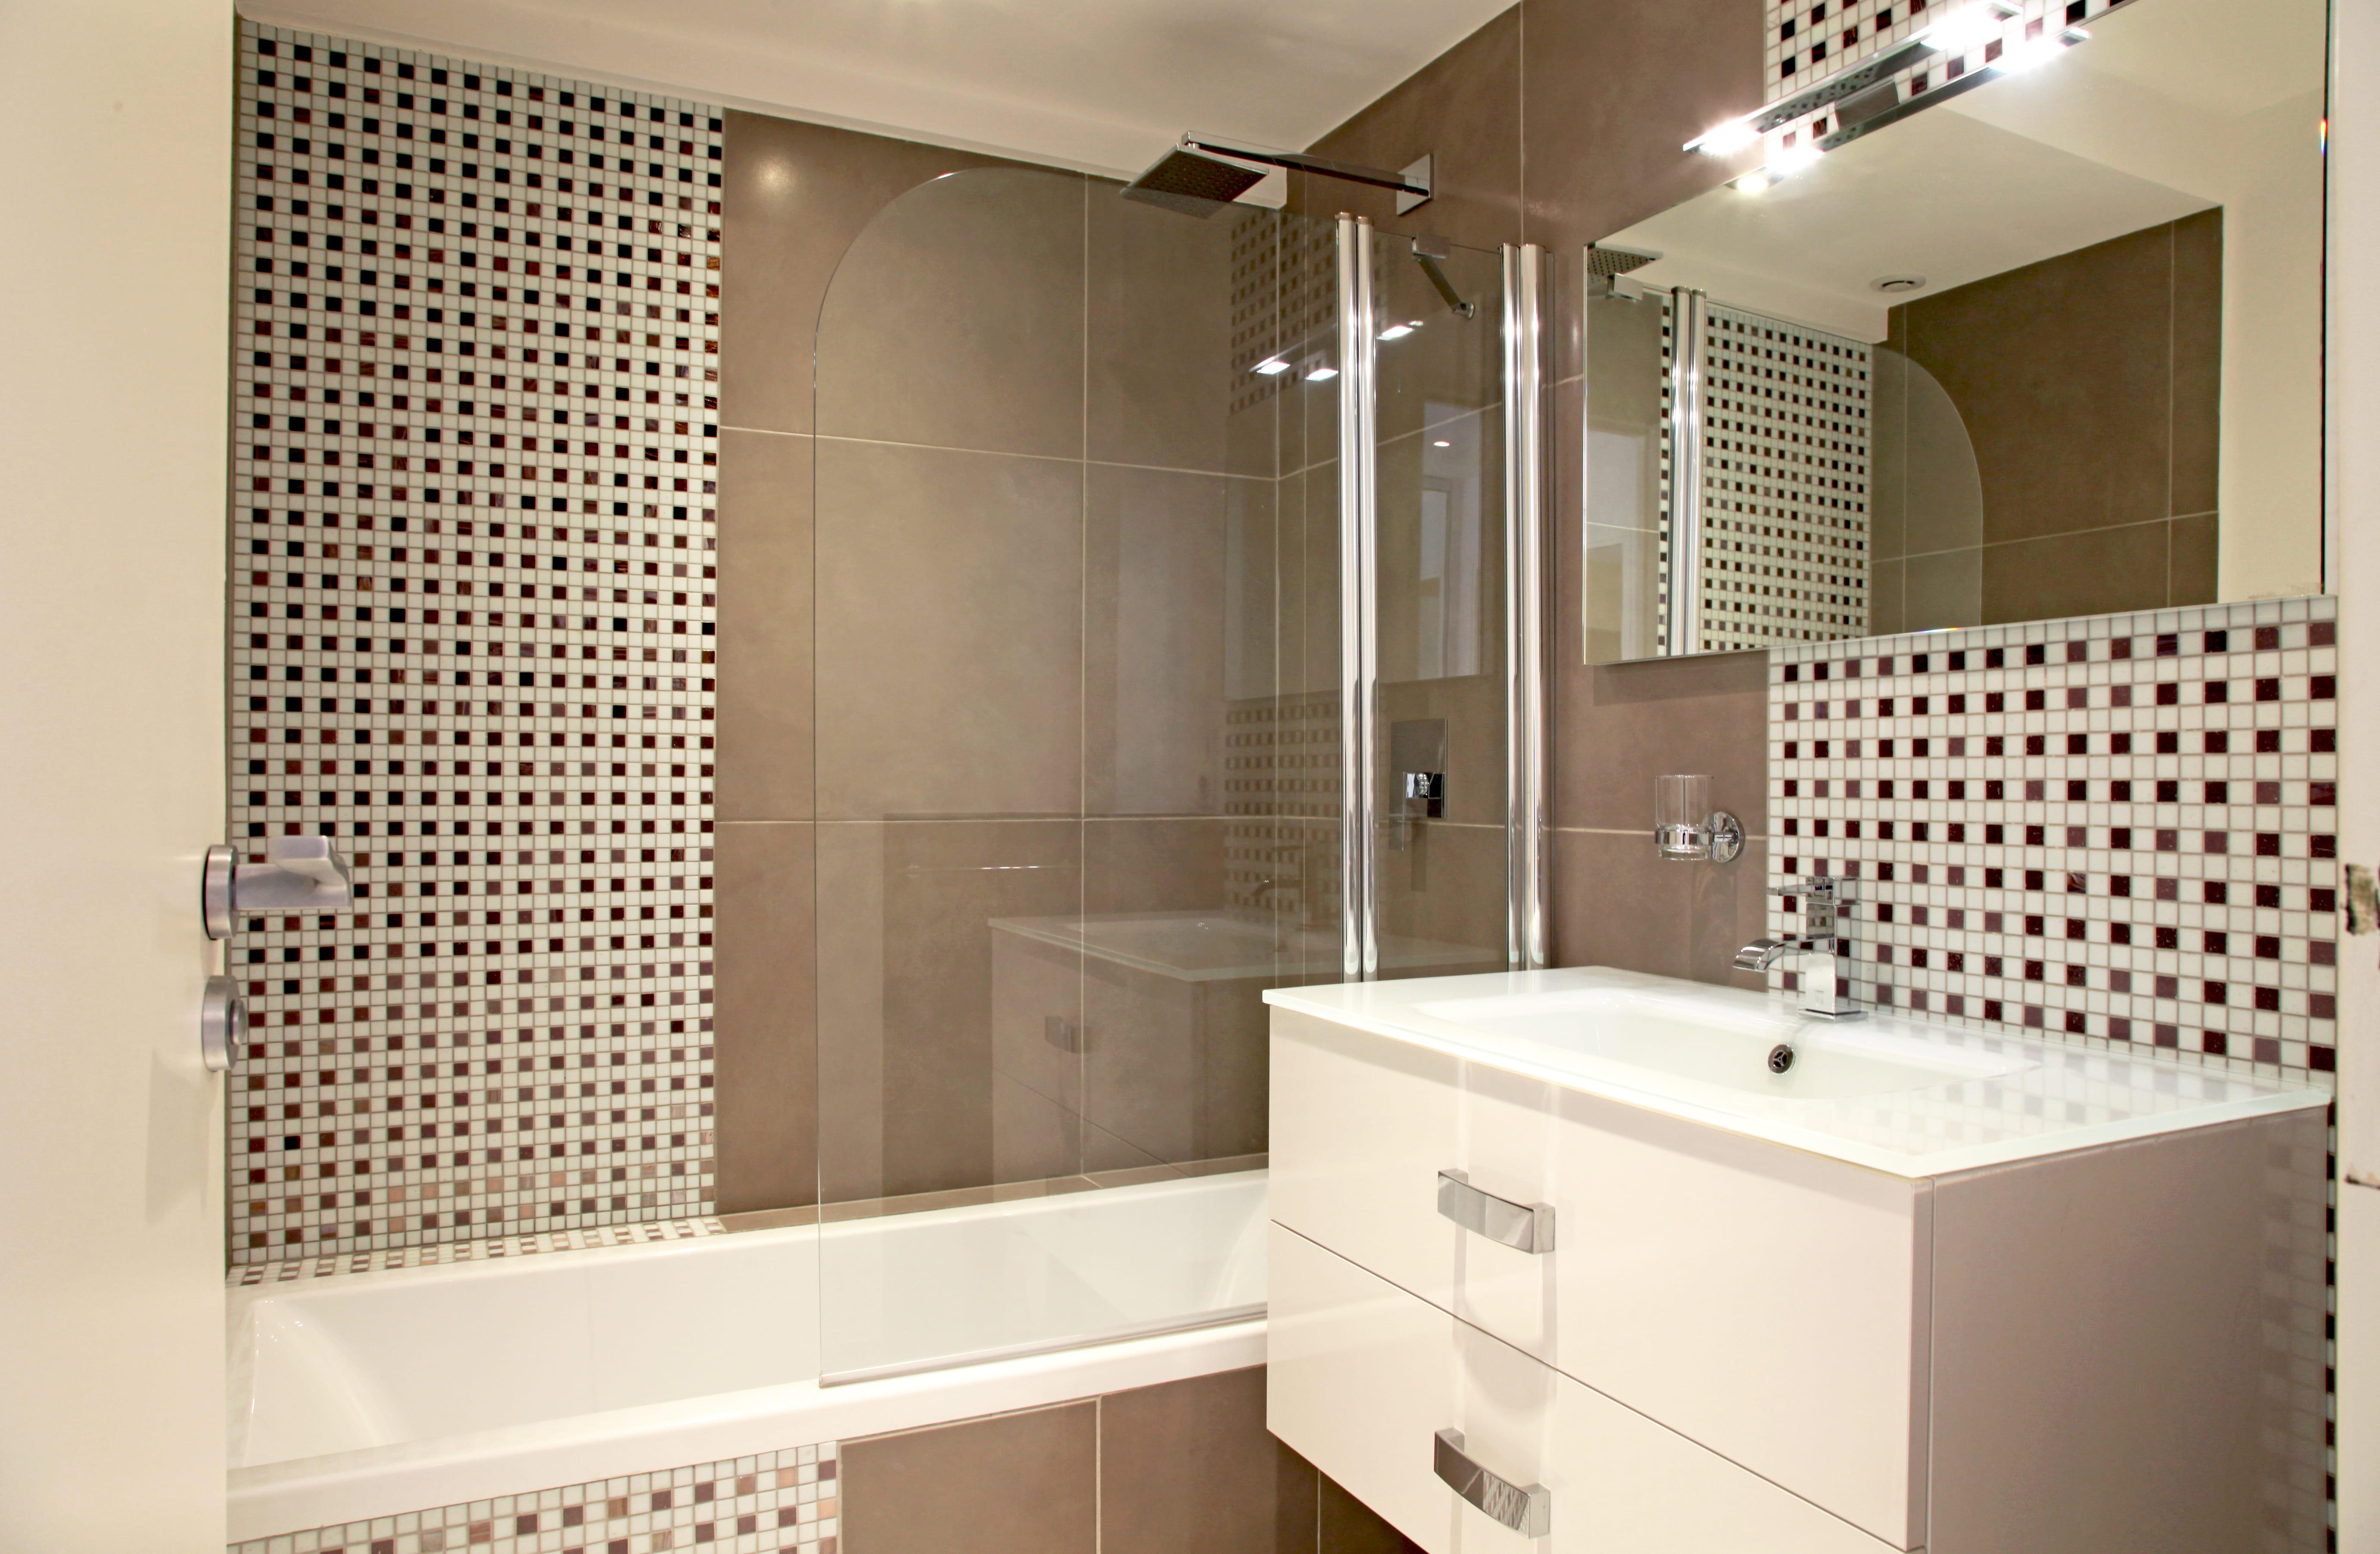 Petite salle de bains contemporaine salle de bains - Salles de bains contemporaines ...